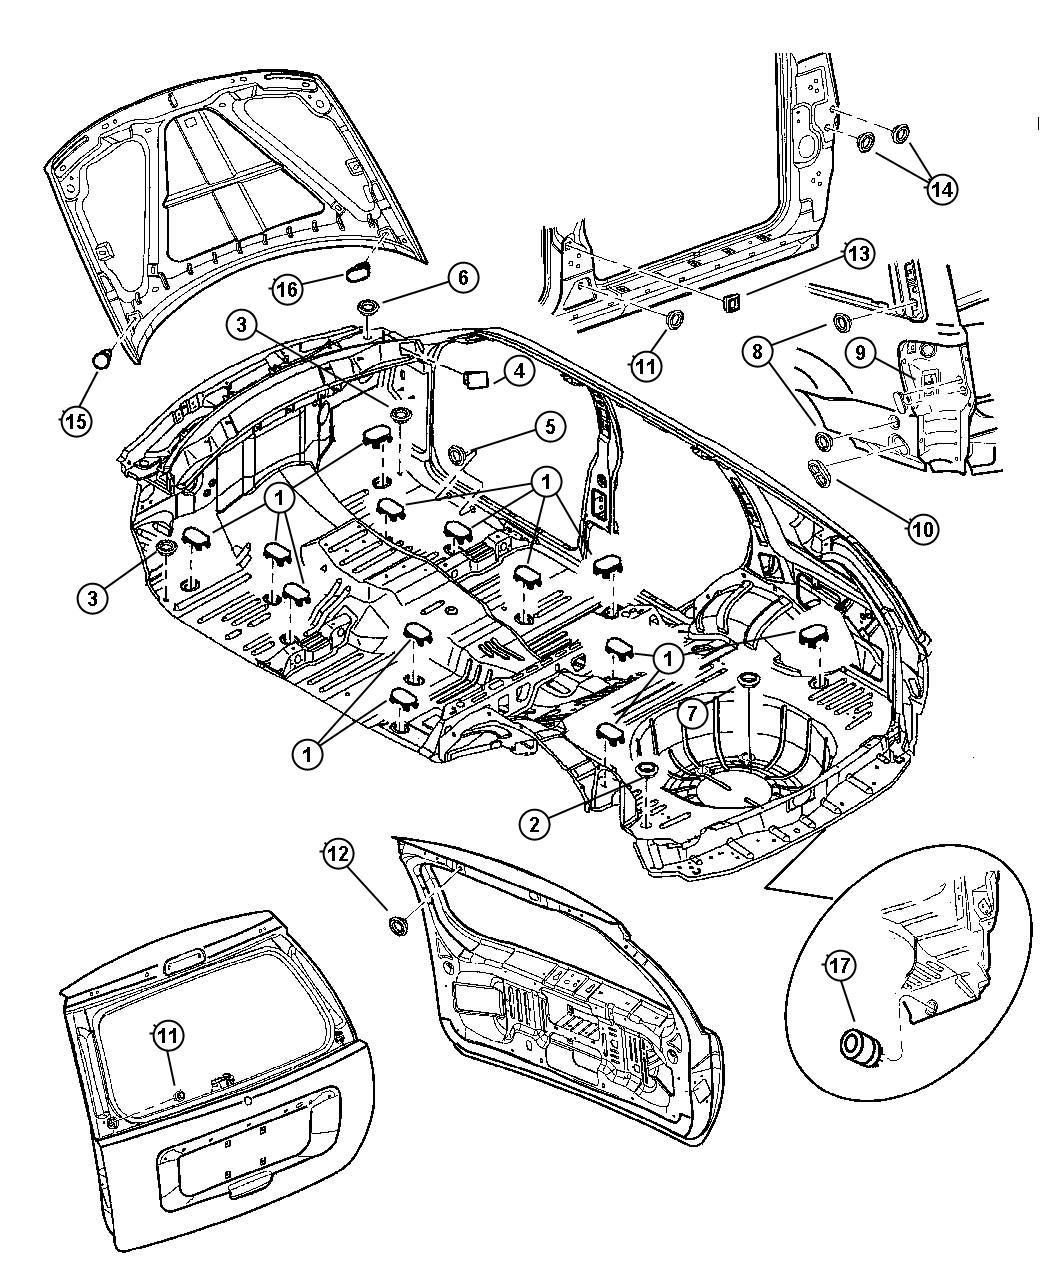 Jeep Grand Cherokee Plug. Body, rear fascia. Aperture